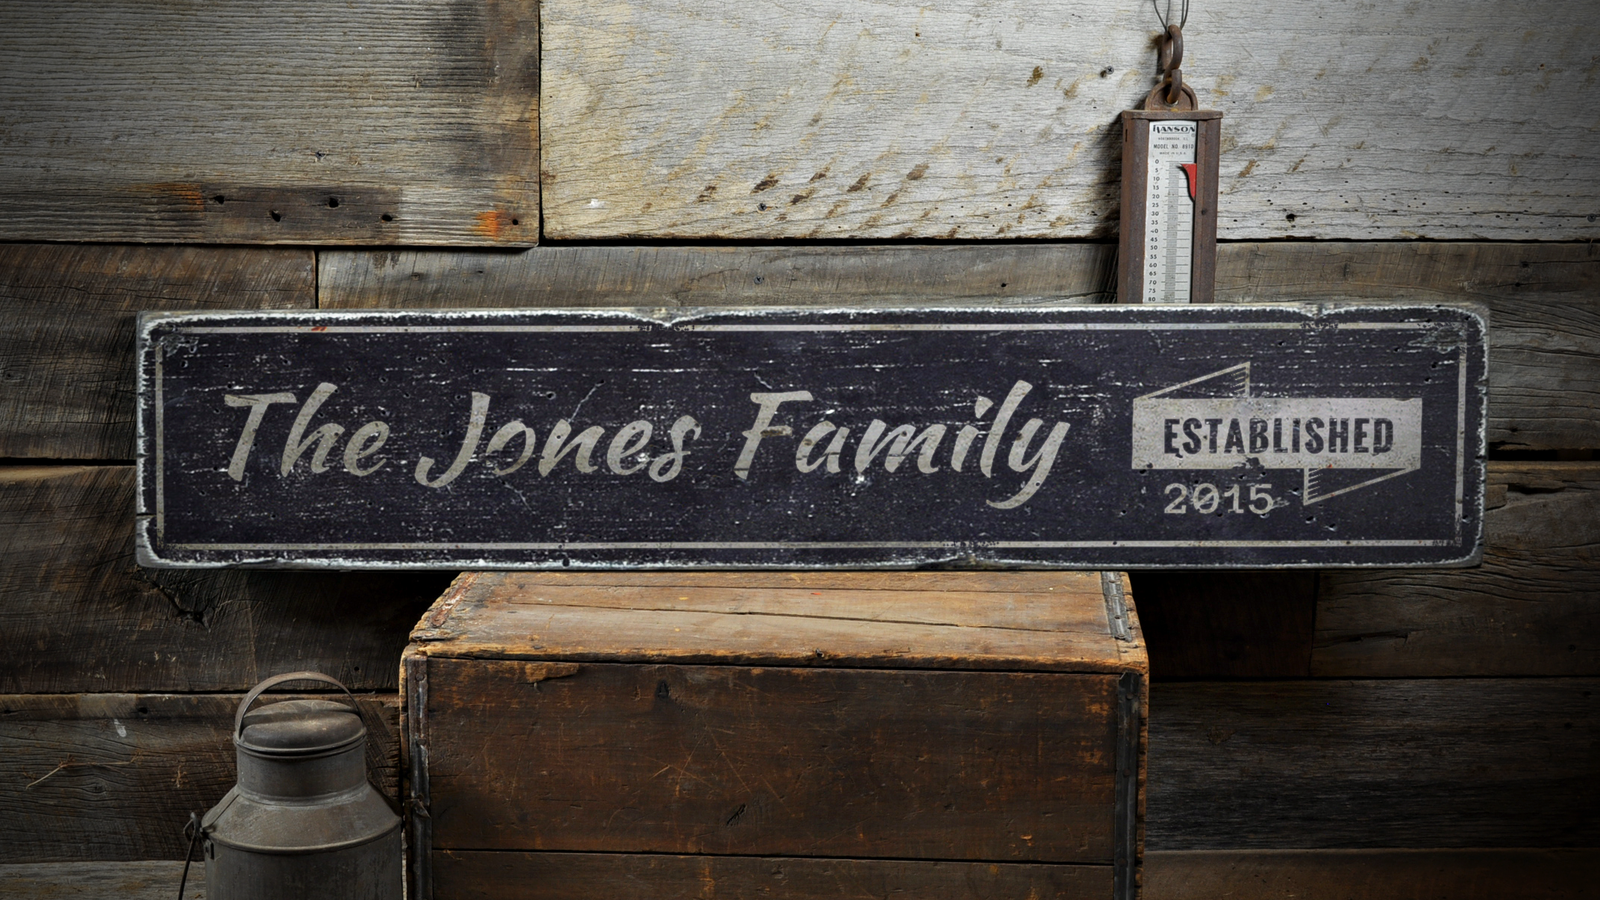 Wedding Decor, Established Date - Rustic Distressed Wood Sign ENS1001303